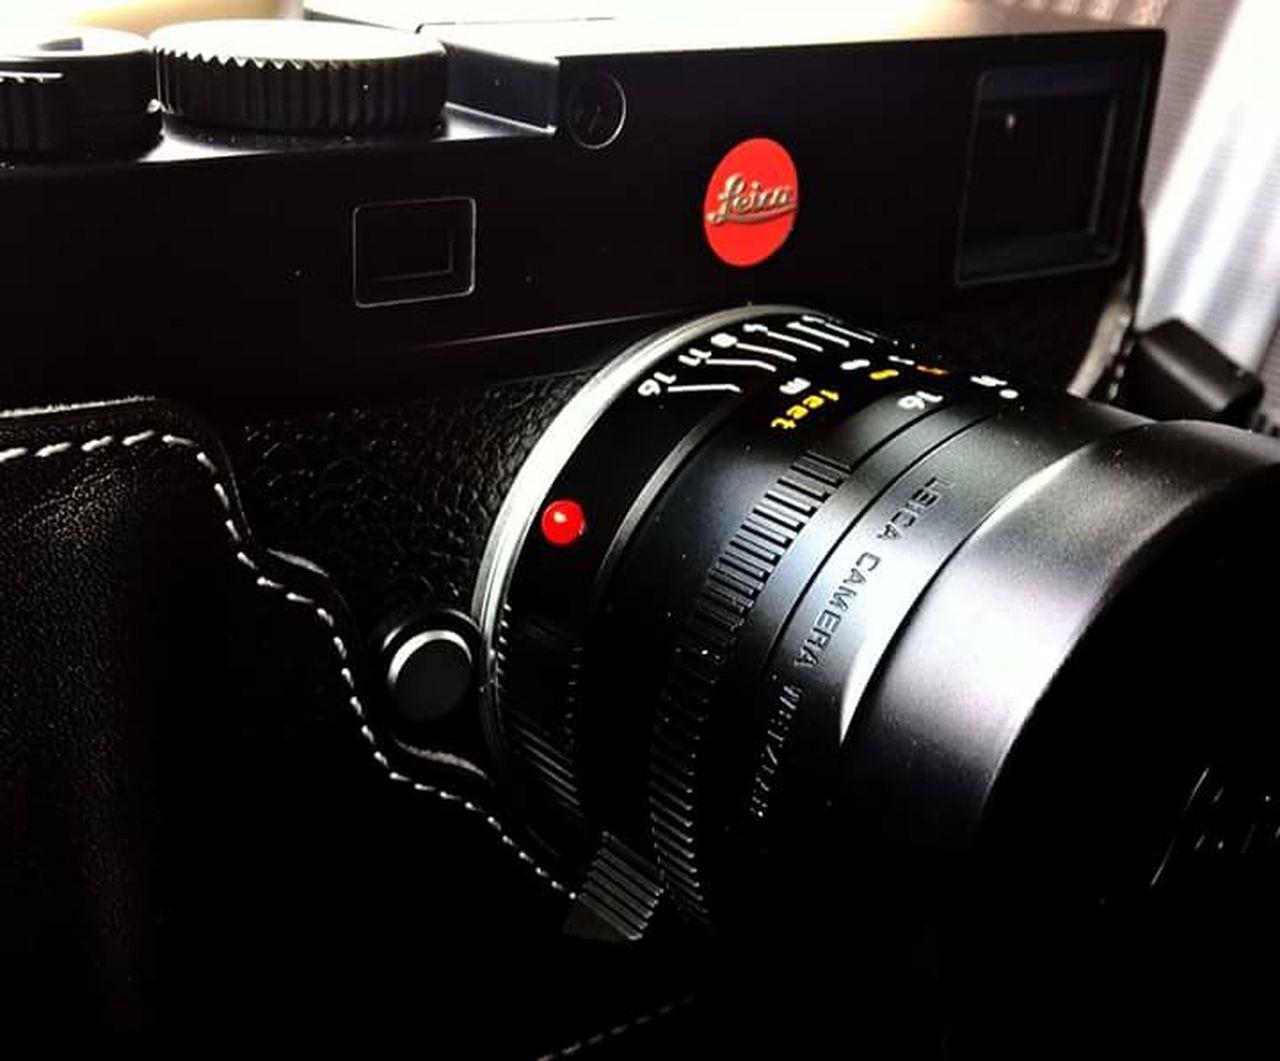 Leicacamera 35mmfilmphotography Leica M262